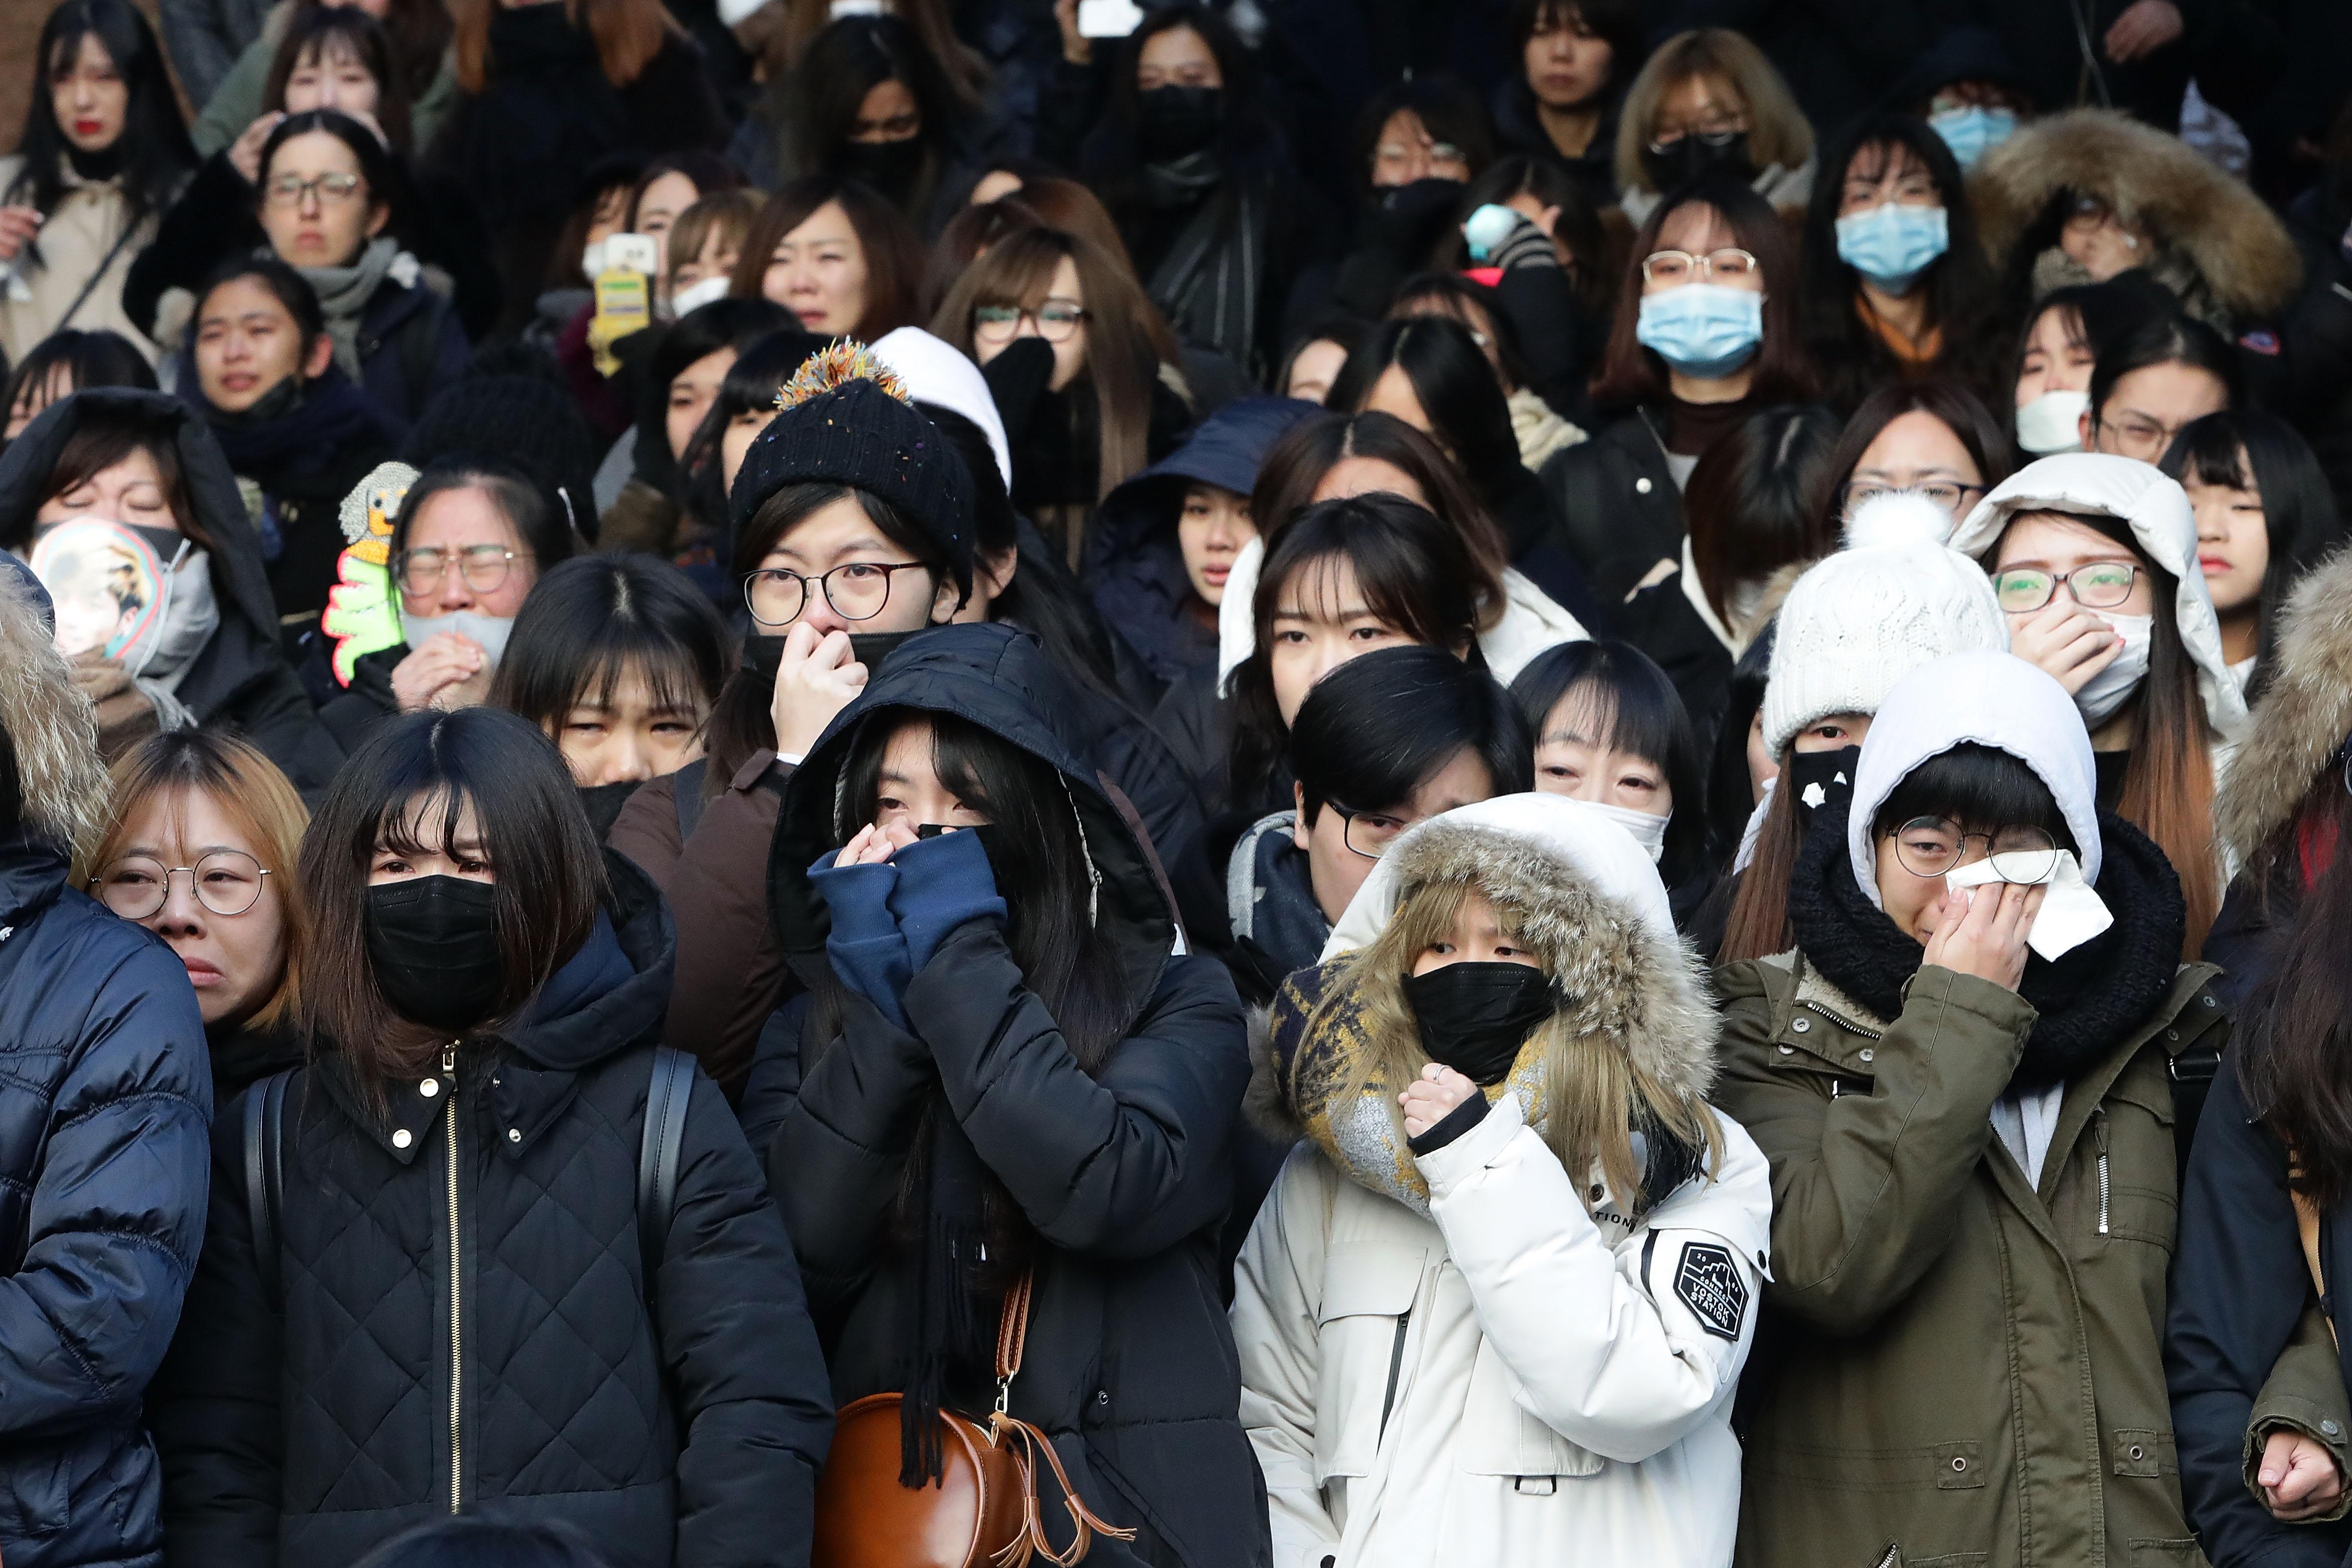 fãs-emocionados-no-funeral-de-Jonghyun